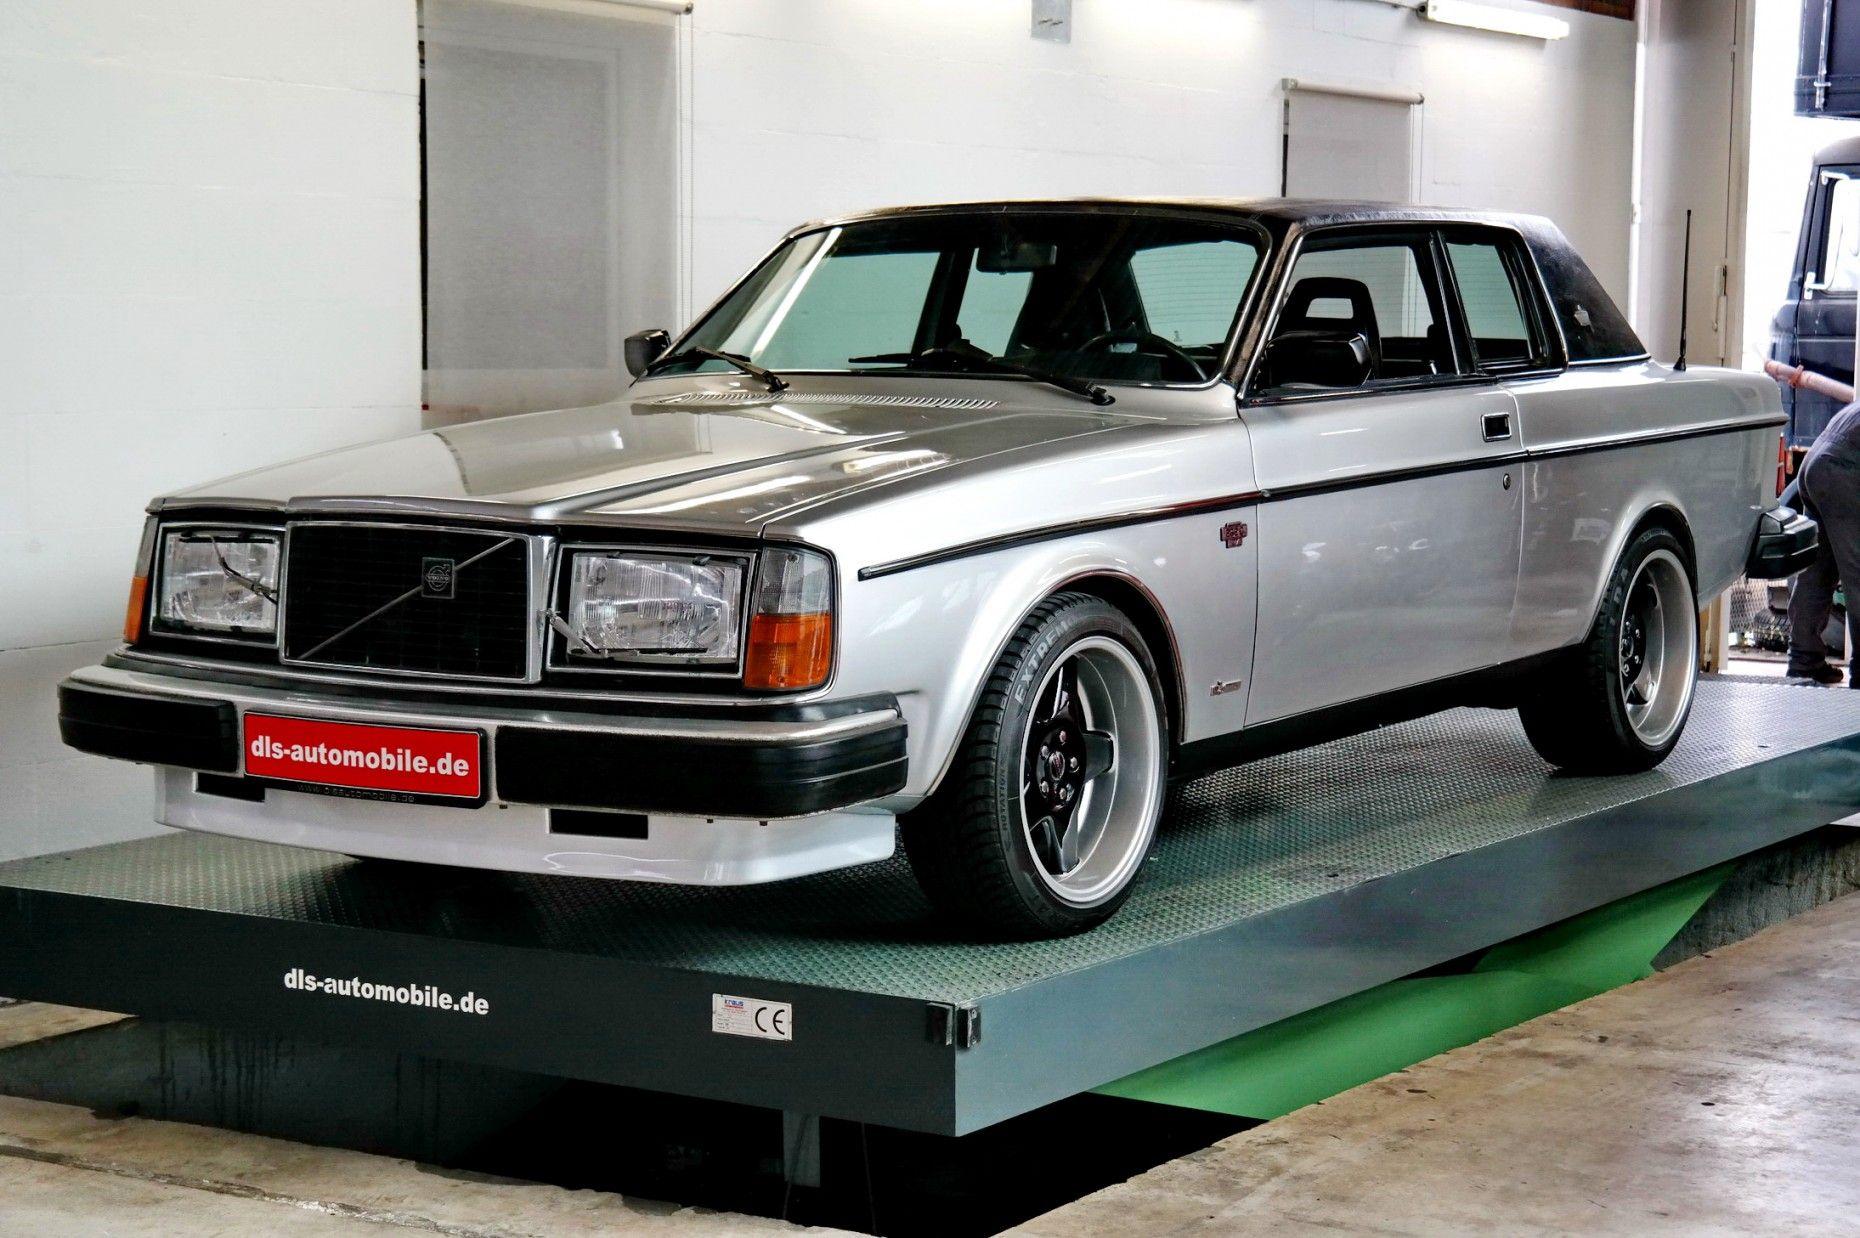 Looks Like A Volvo Pulls Like A V10 Bmw Brakes Like A Porsche Speedhunters Volvo Coupe Volvo Cars Volvo